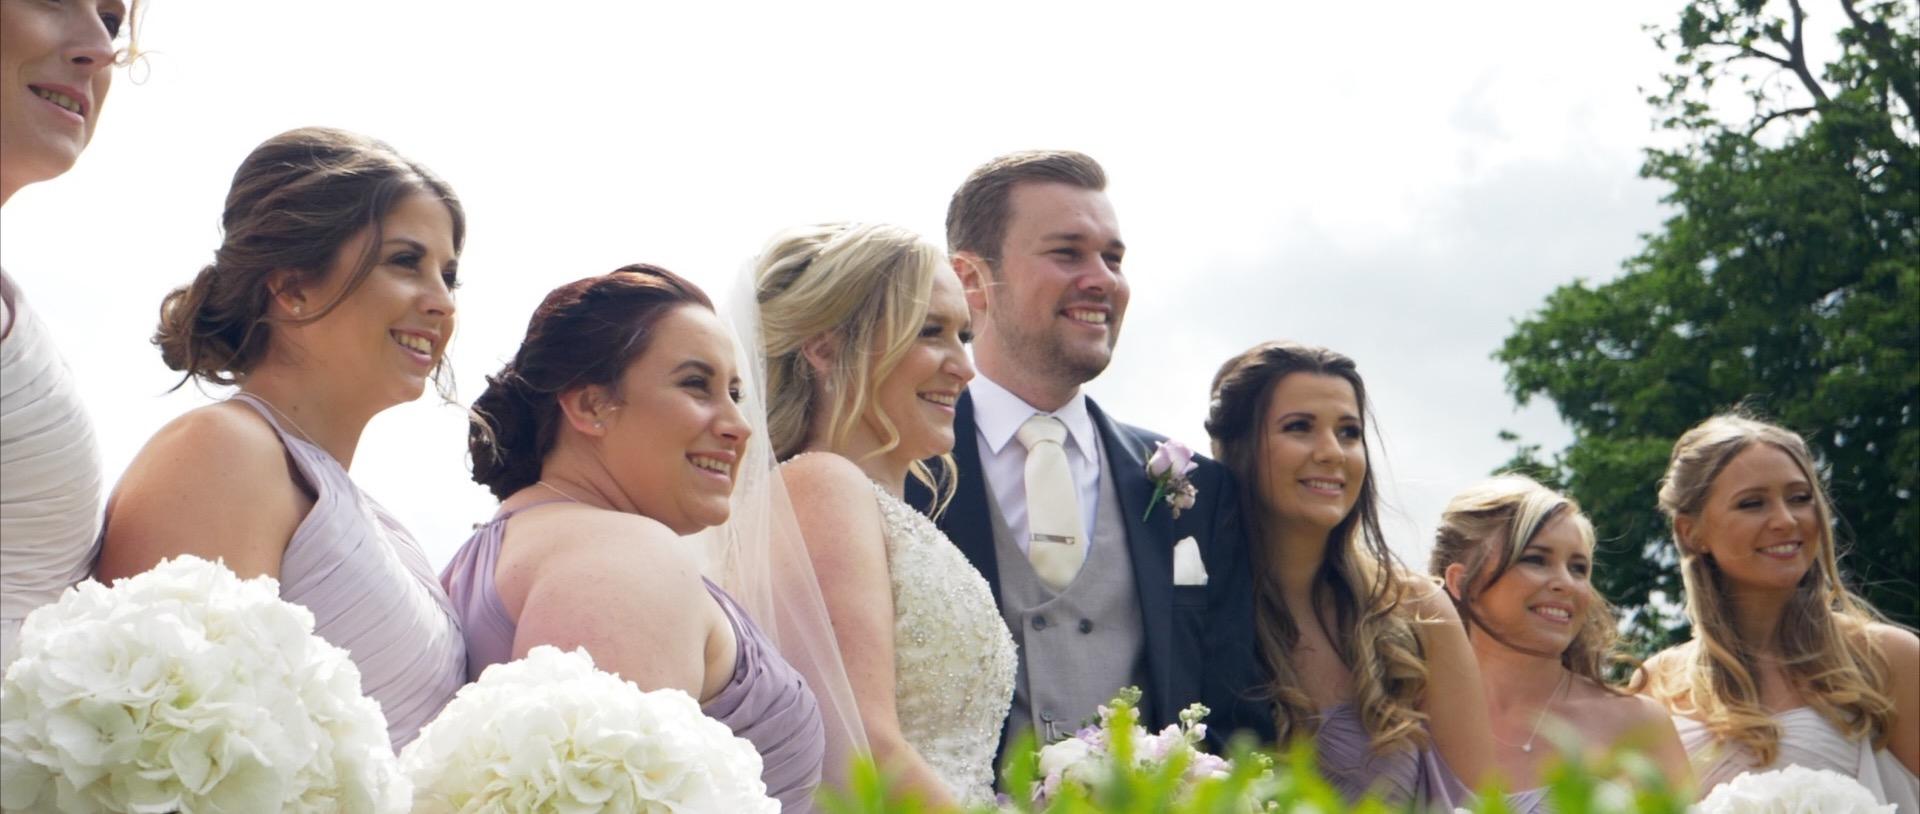 Bridesmaids Essex wedding video.jpg